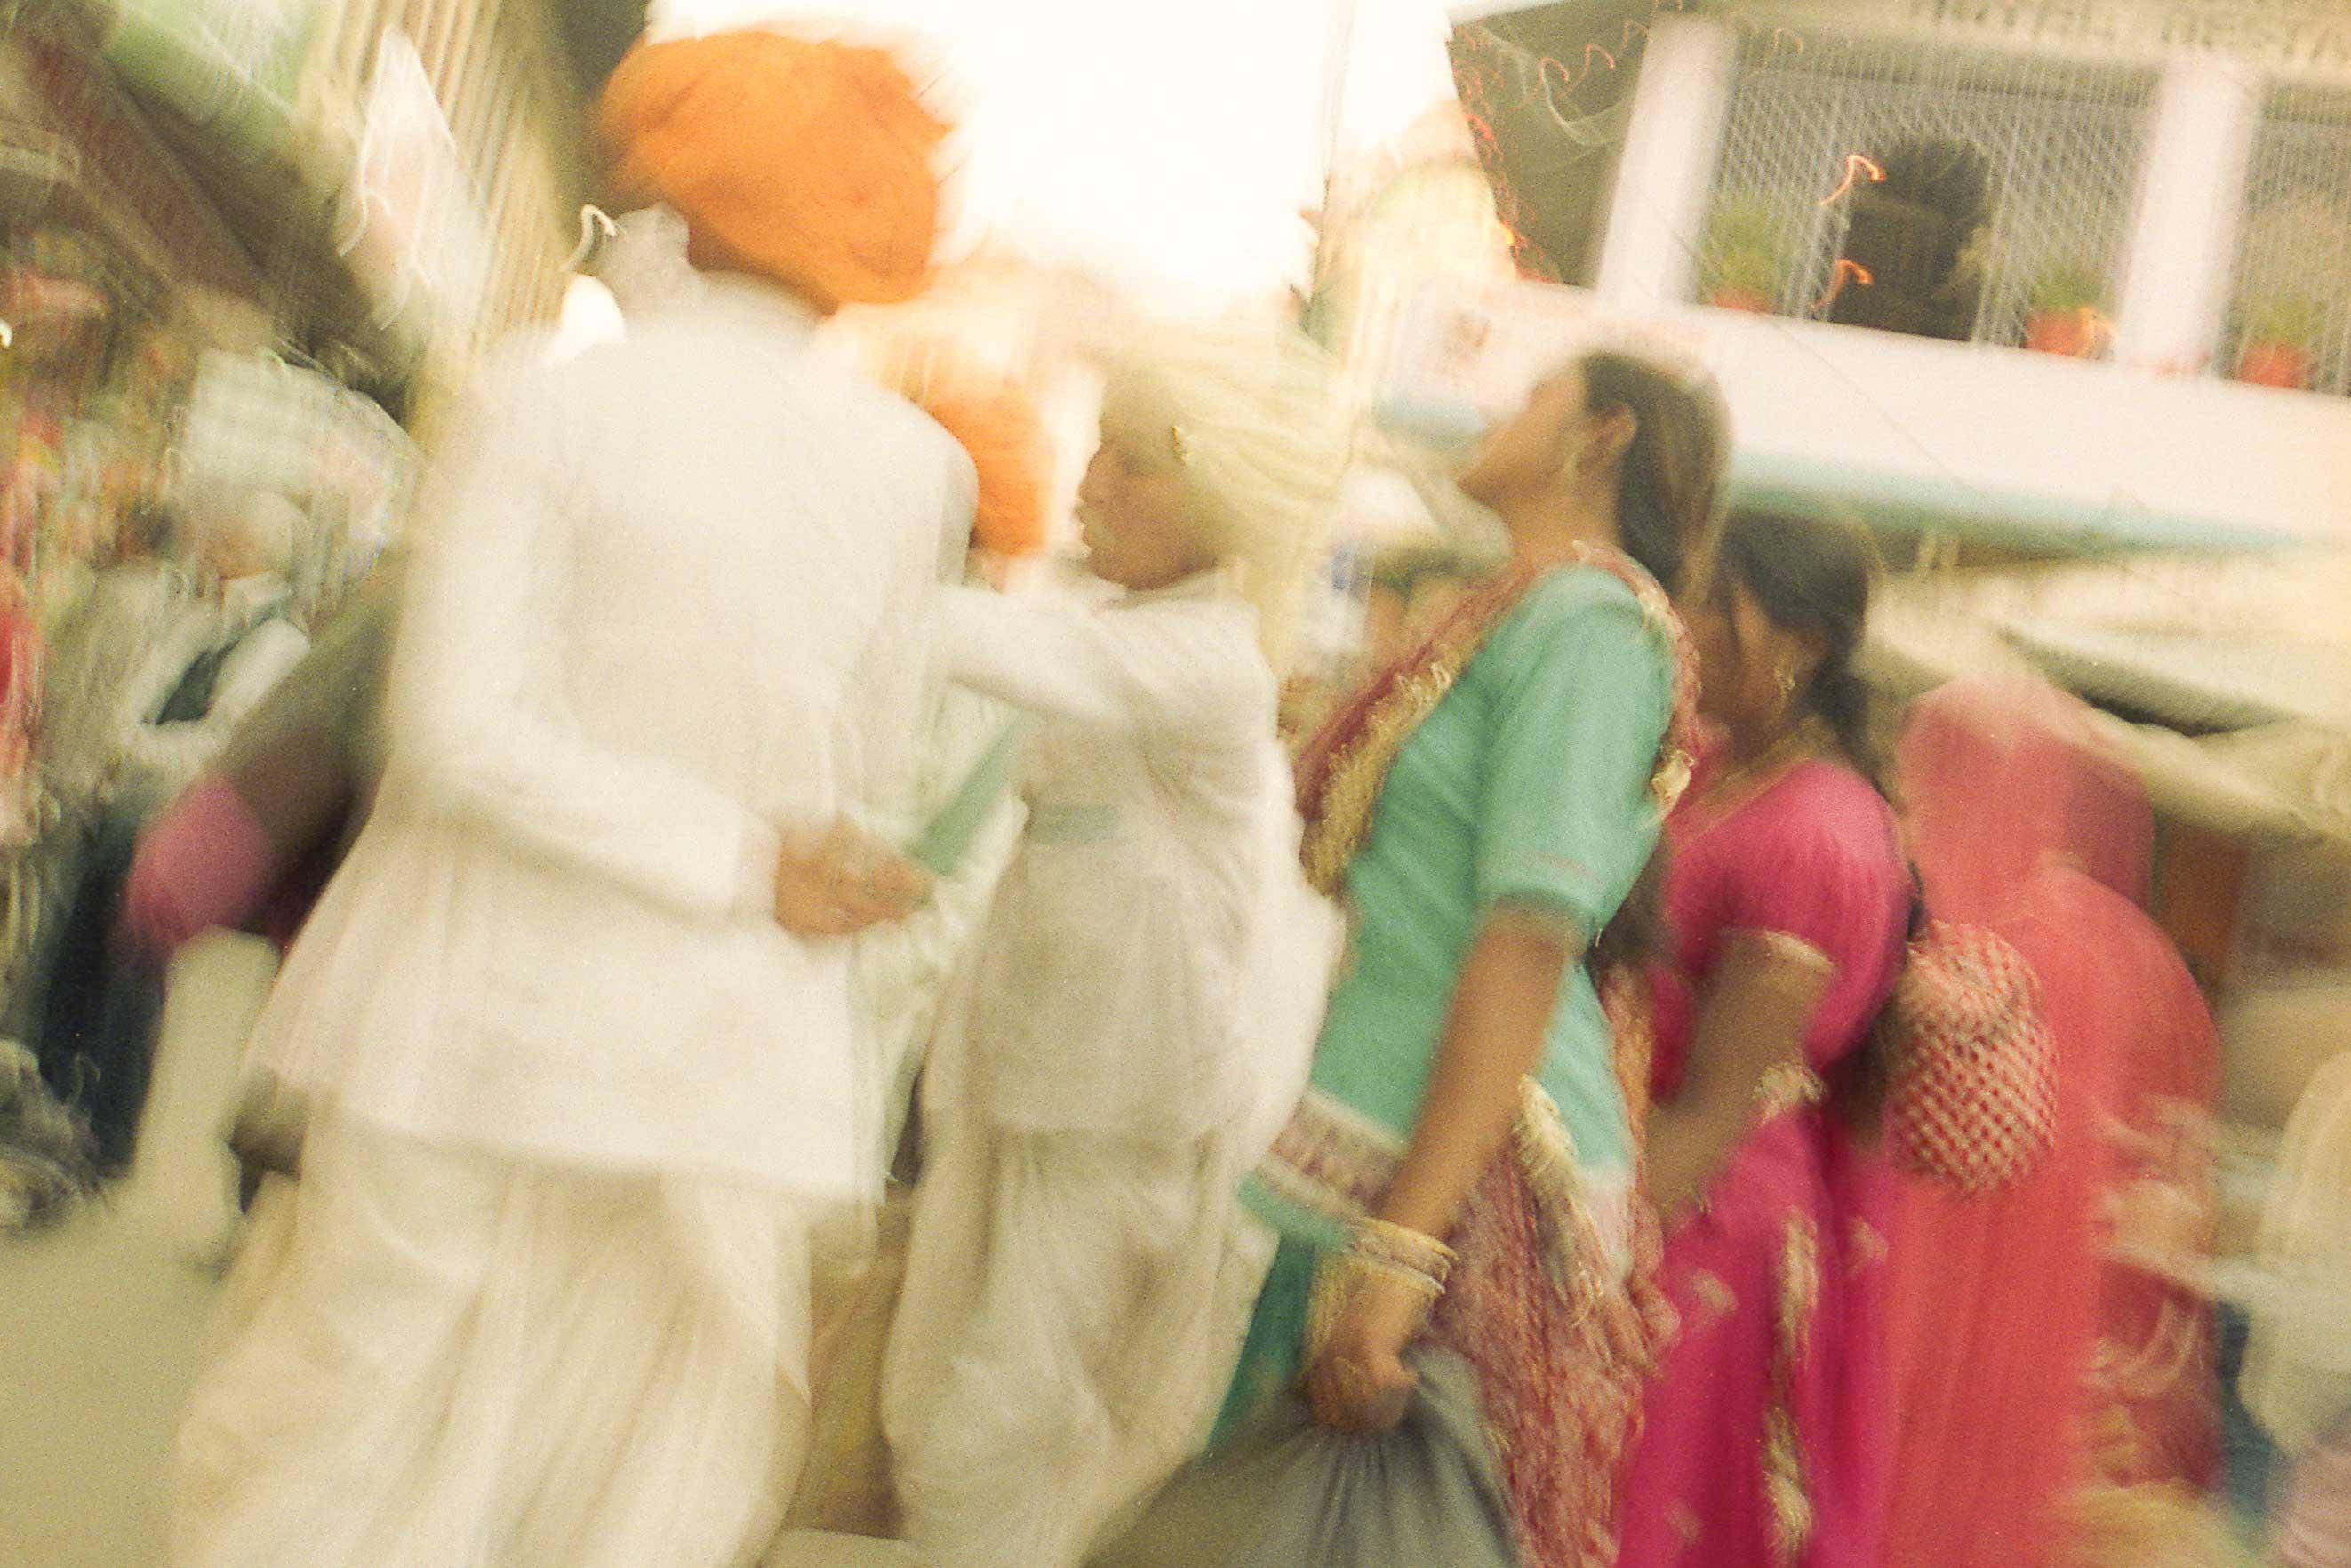 India, fine art photography, raffaele ferrari, seascape, travel photography, asia, fotografo arte, film photography, Woman dry blue sari, Karnataka, India